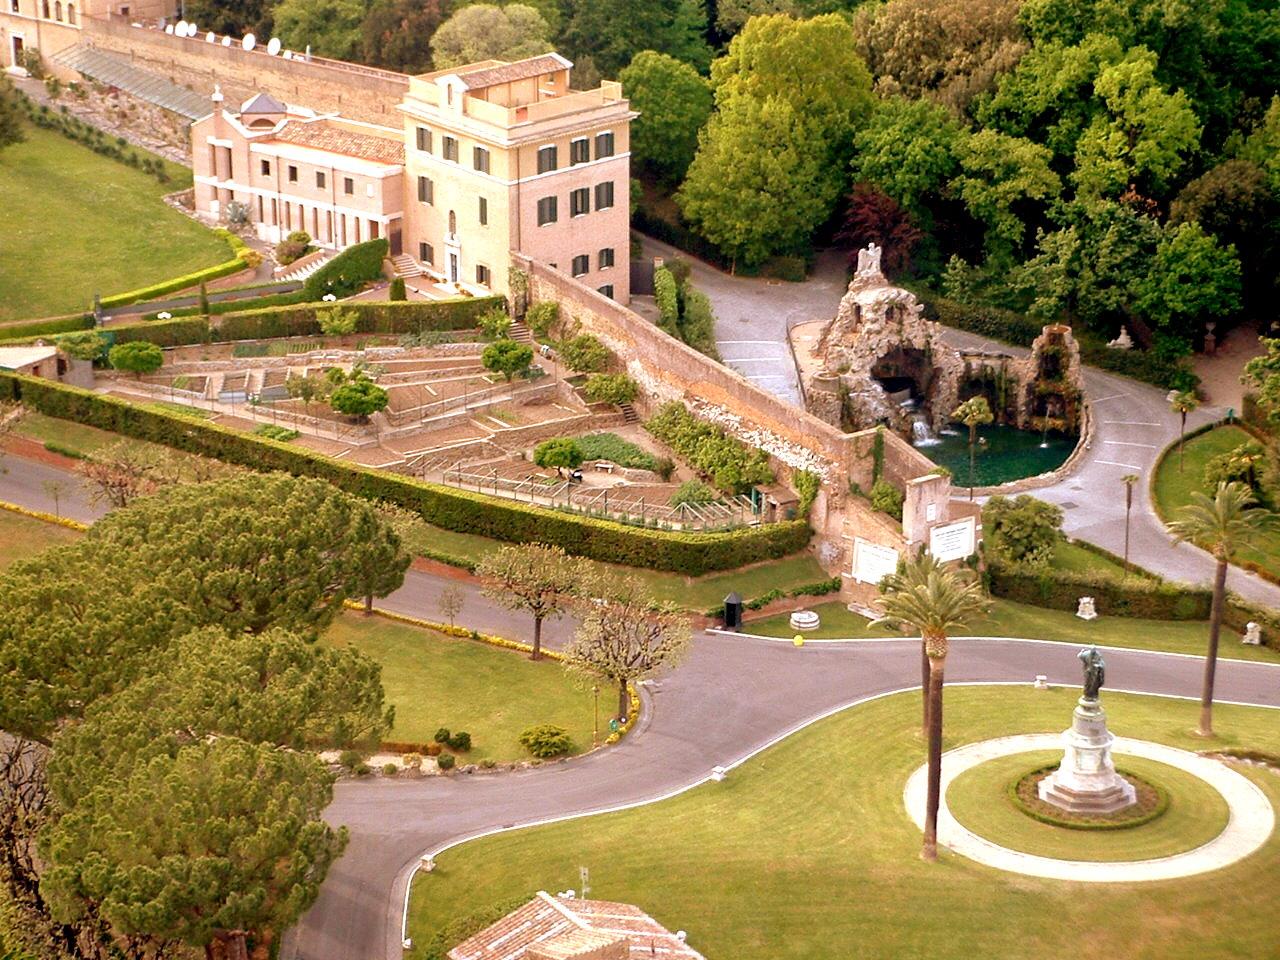 Entre la nuit et la journ e el vaticano inolvidable visita for Jardines vaticanos